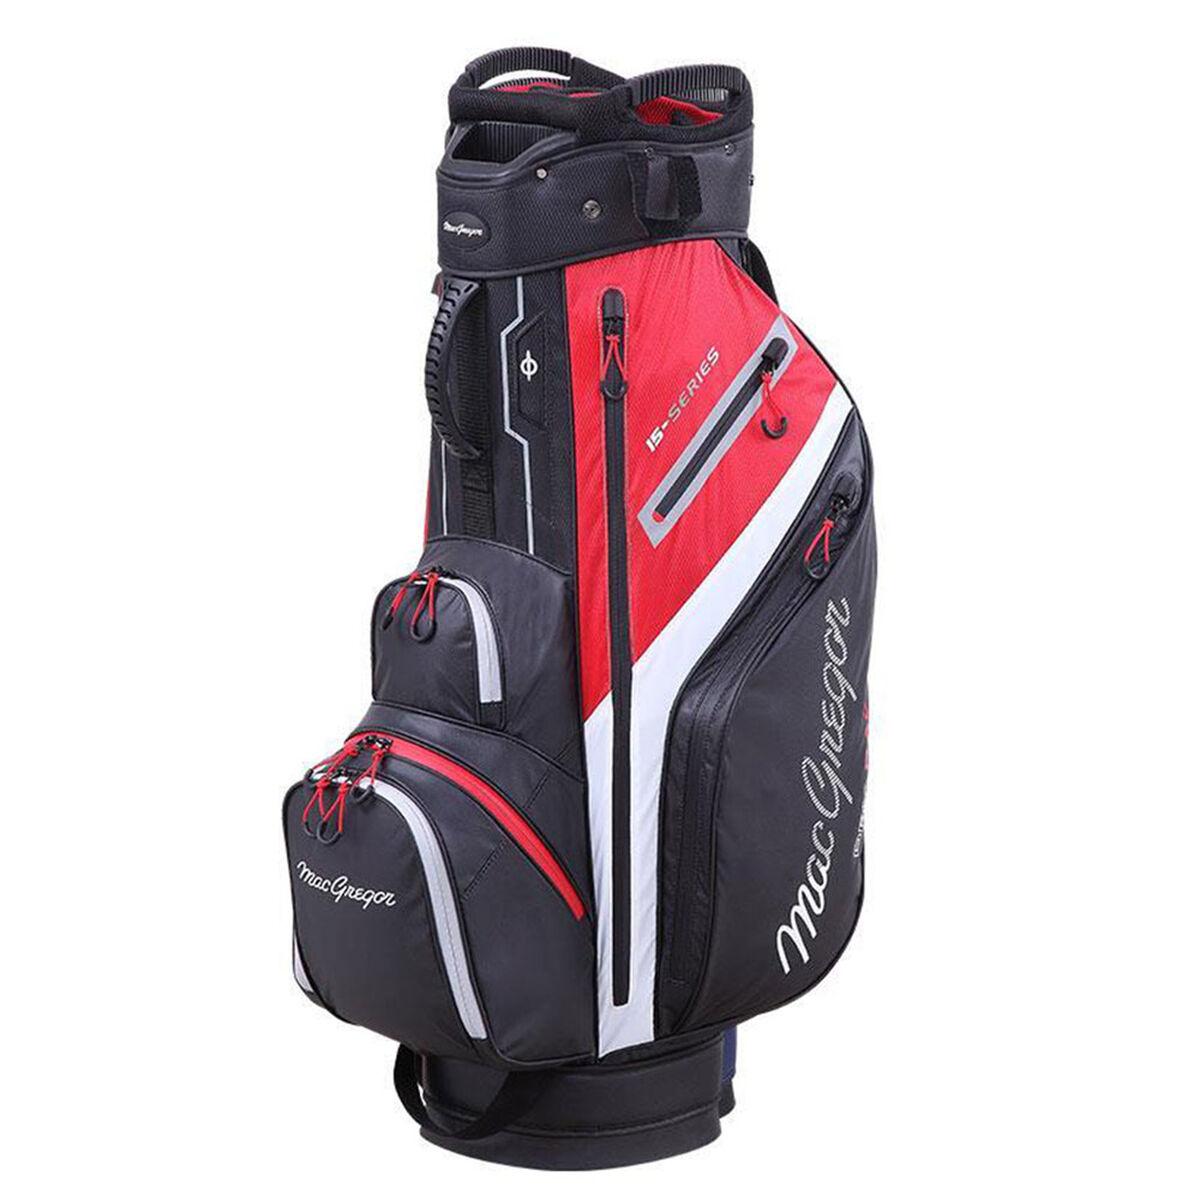 MacGregor 15-Series Water-Resistant Golf Cart Bag, Black/red   American Golf